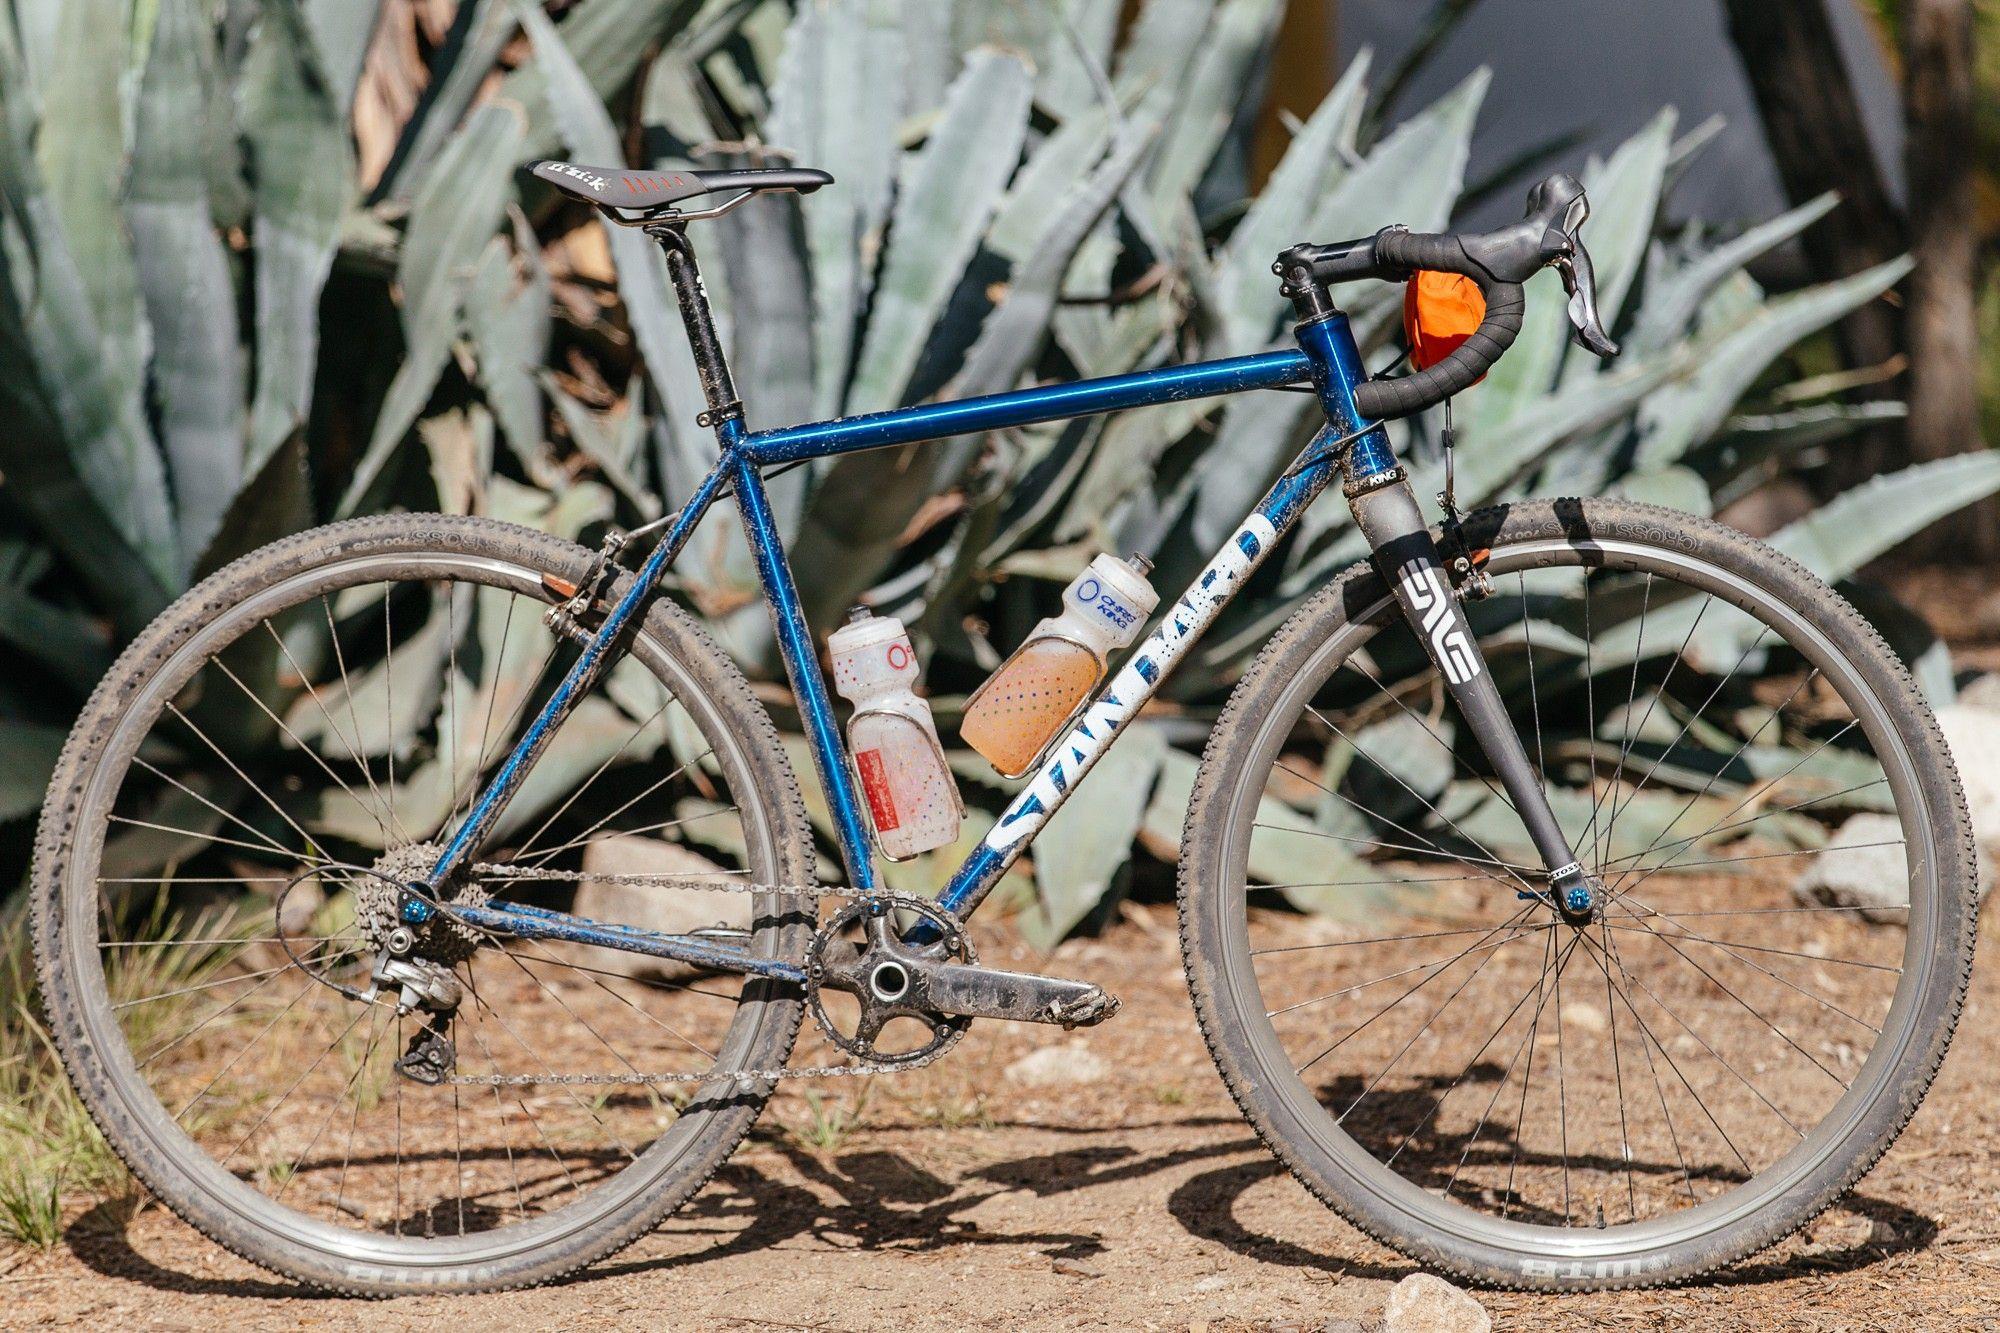 Huy S Standard Byke Co Cross Bike With Images Bike